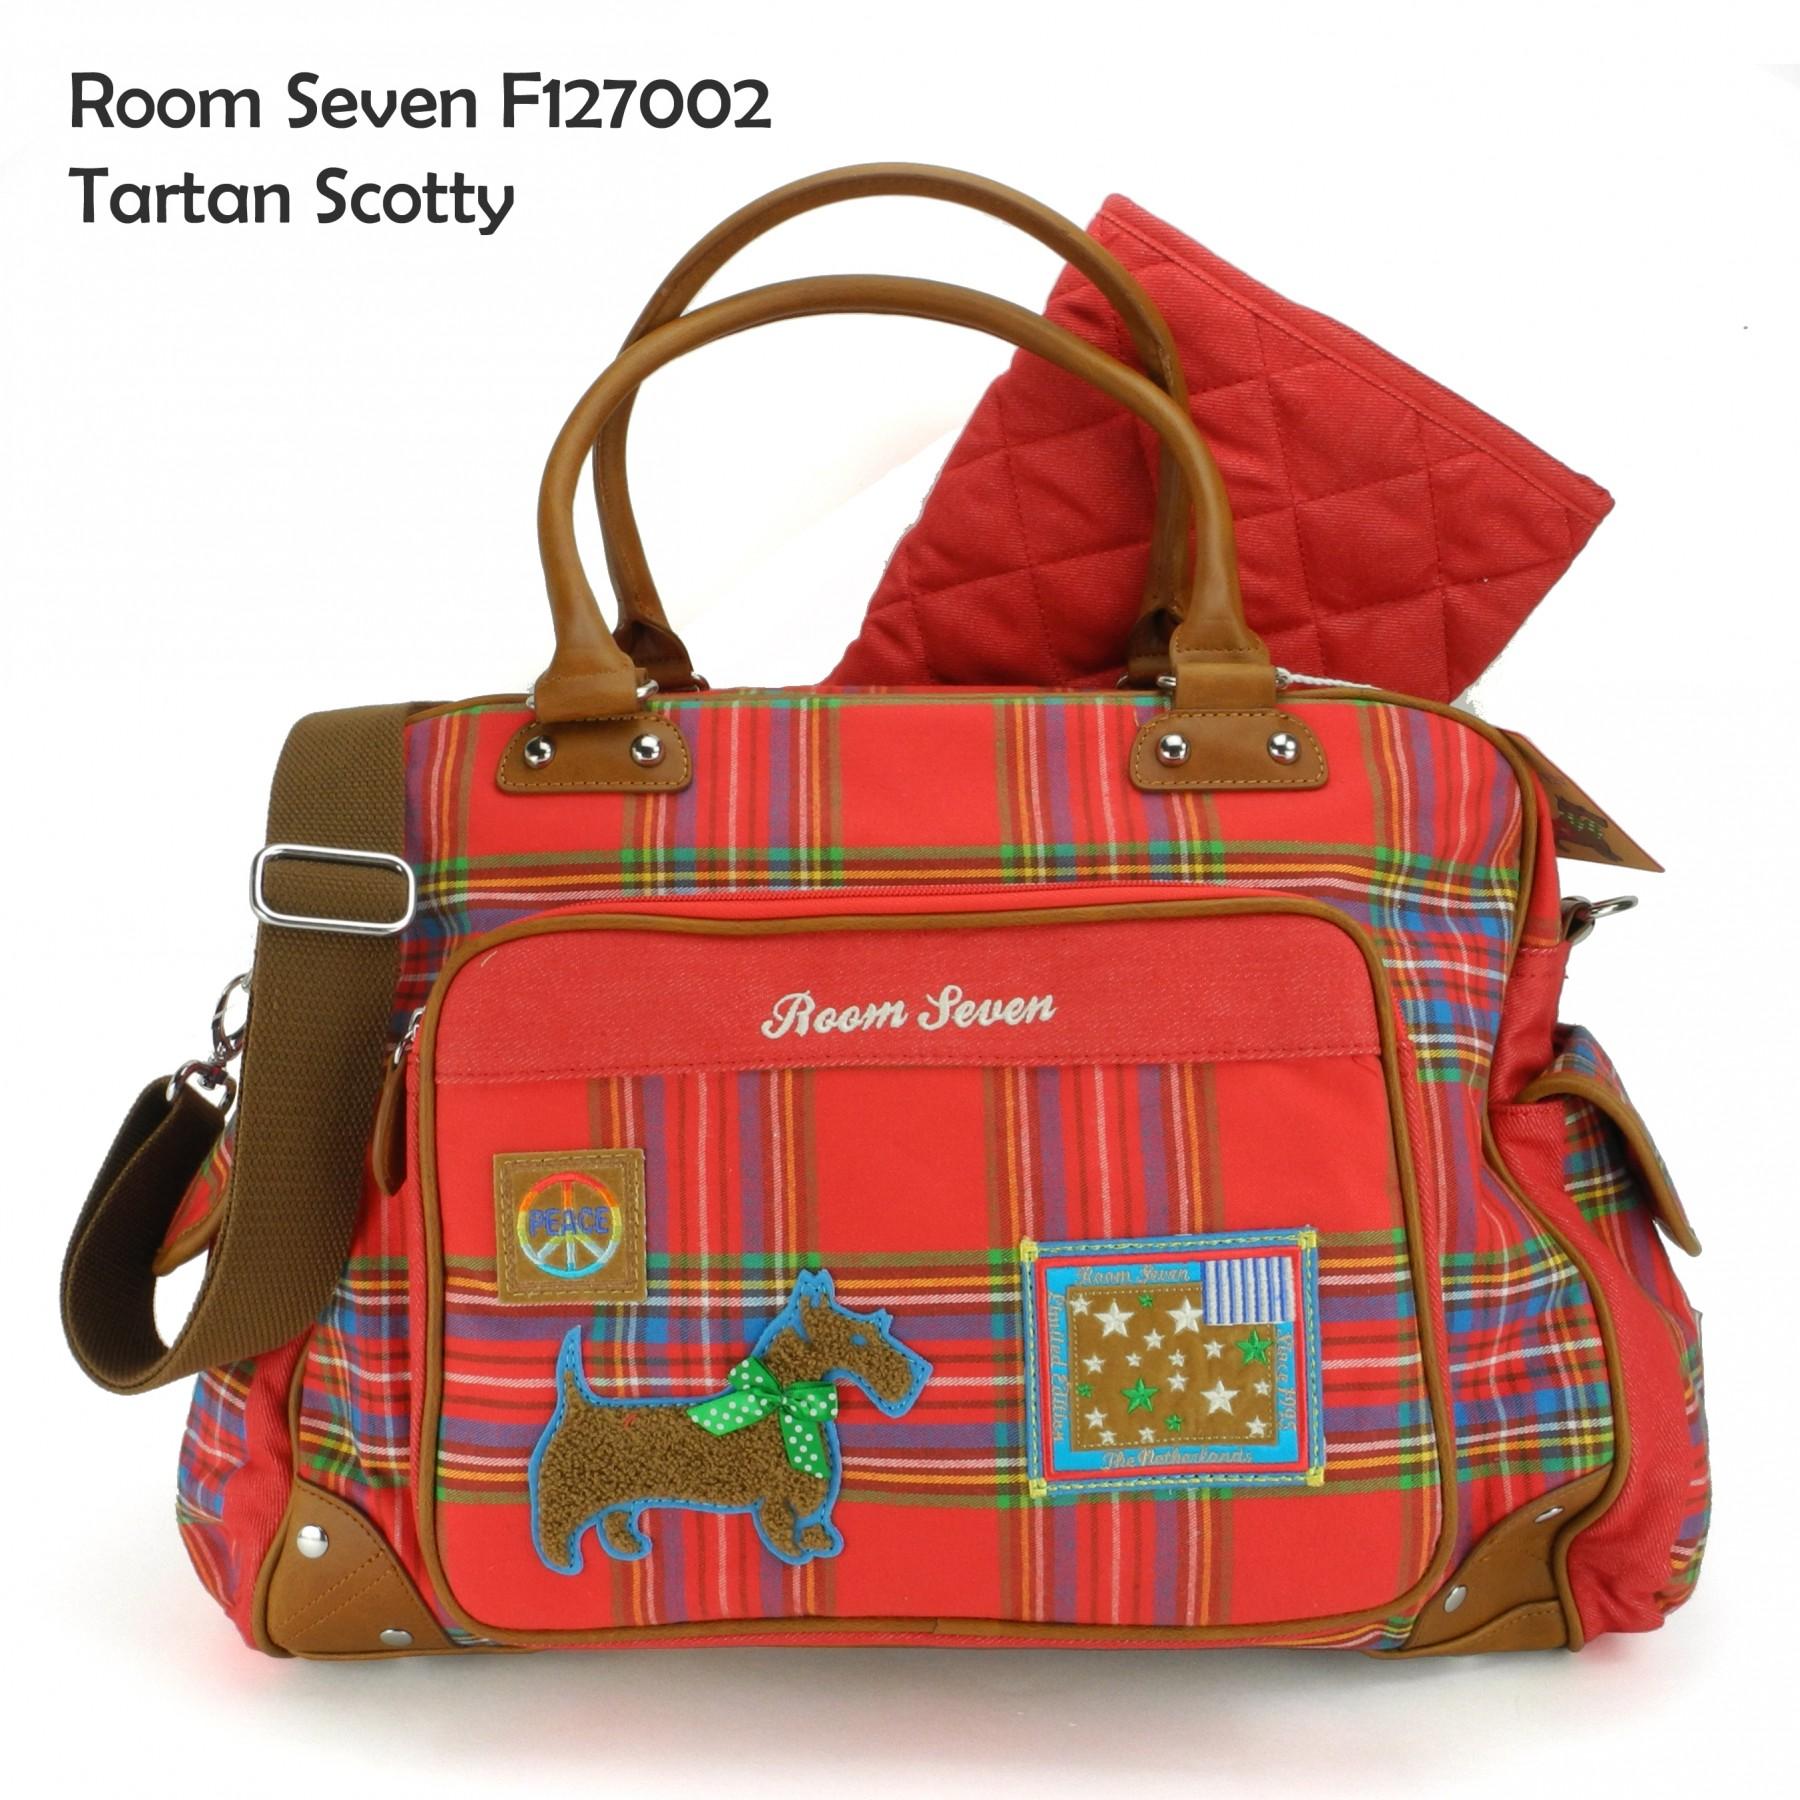 room seven wickeltasche tartan scotty diaperbag f127004 ebay. Black Bedroom Furniture Sets. Home Design Ideas